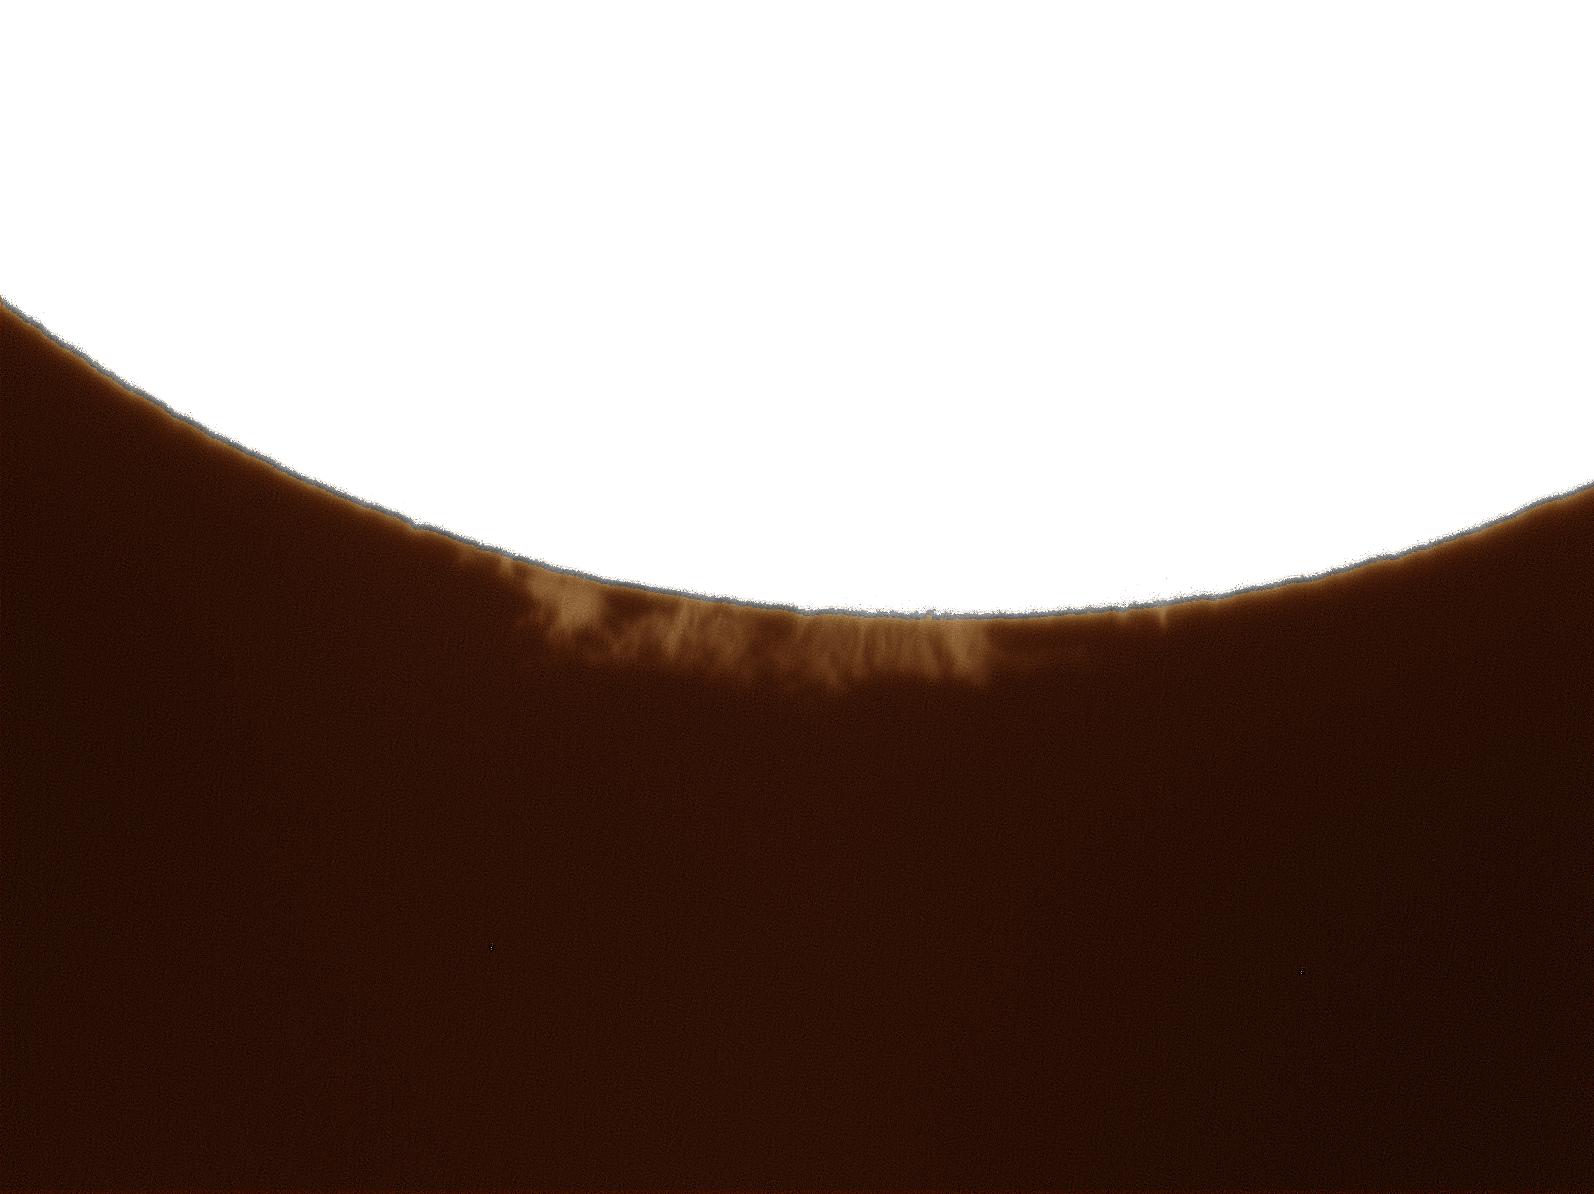 Sun of 16.07.13 | SPONLI - News